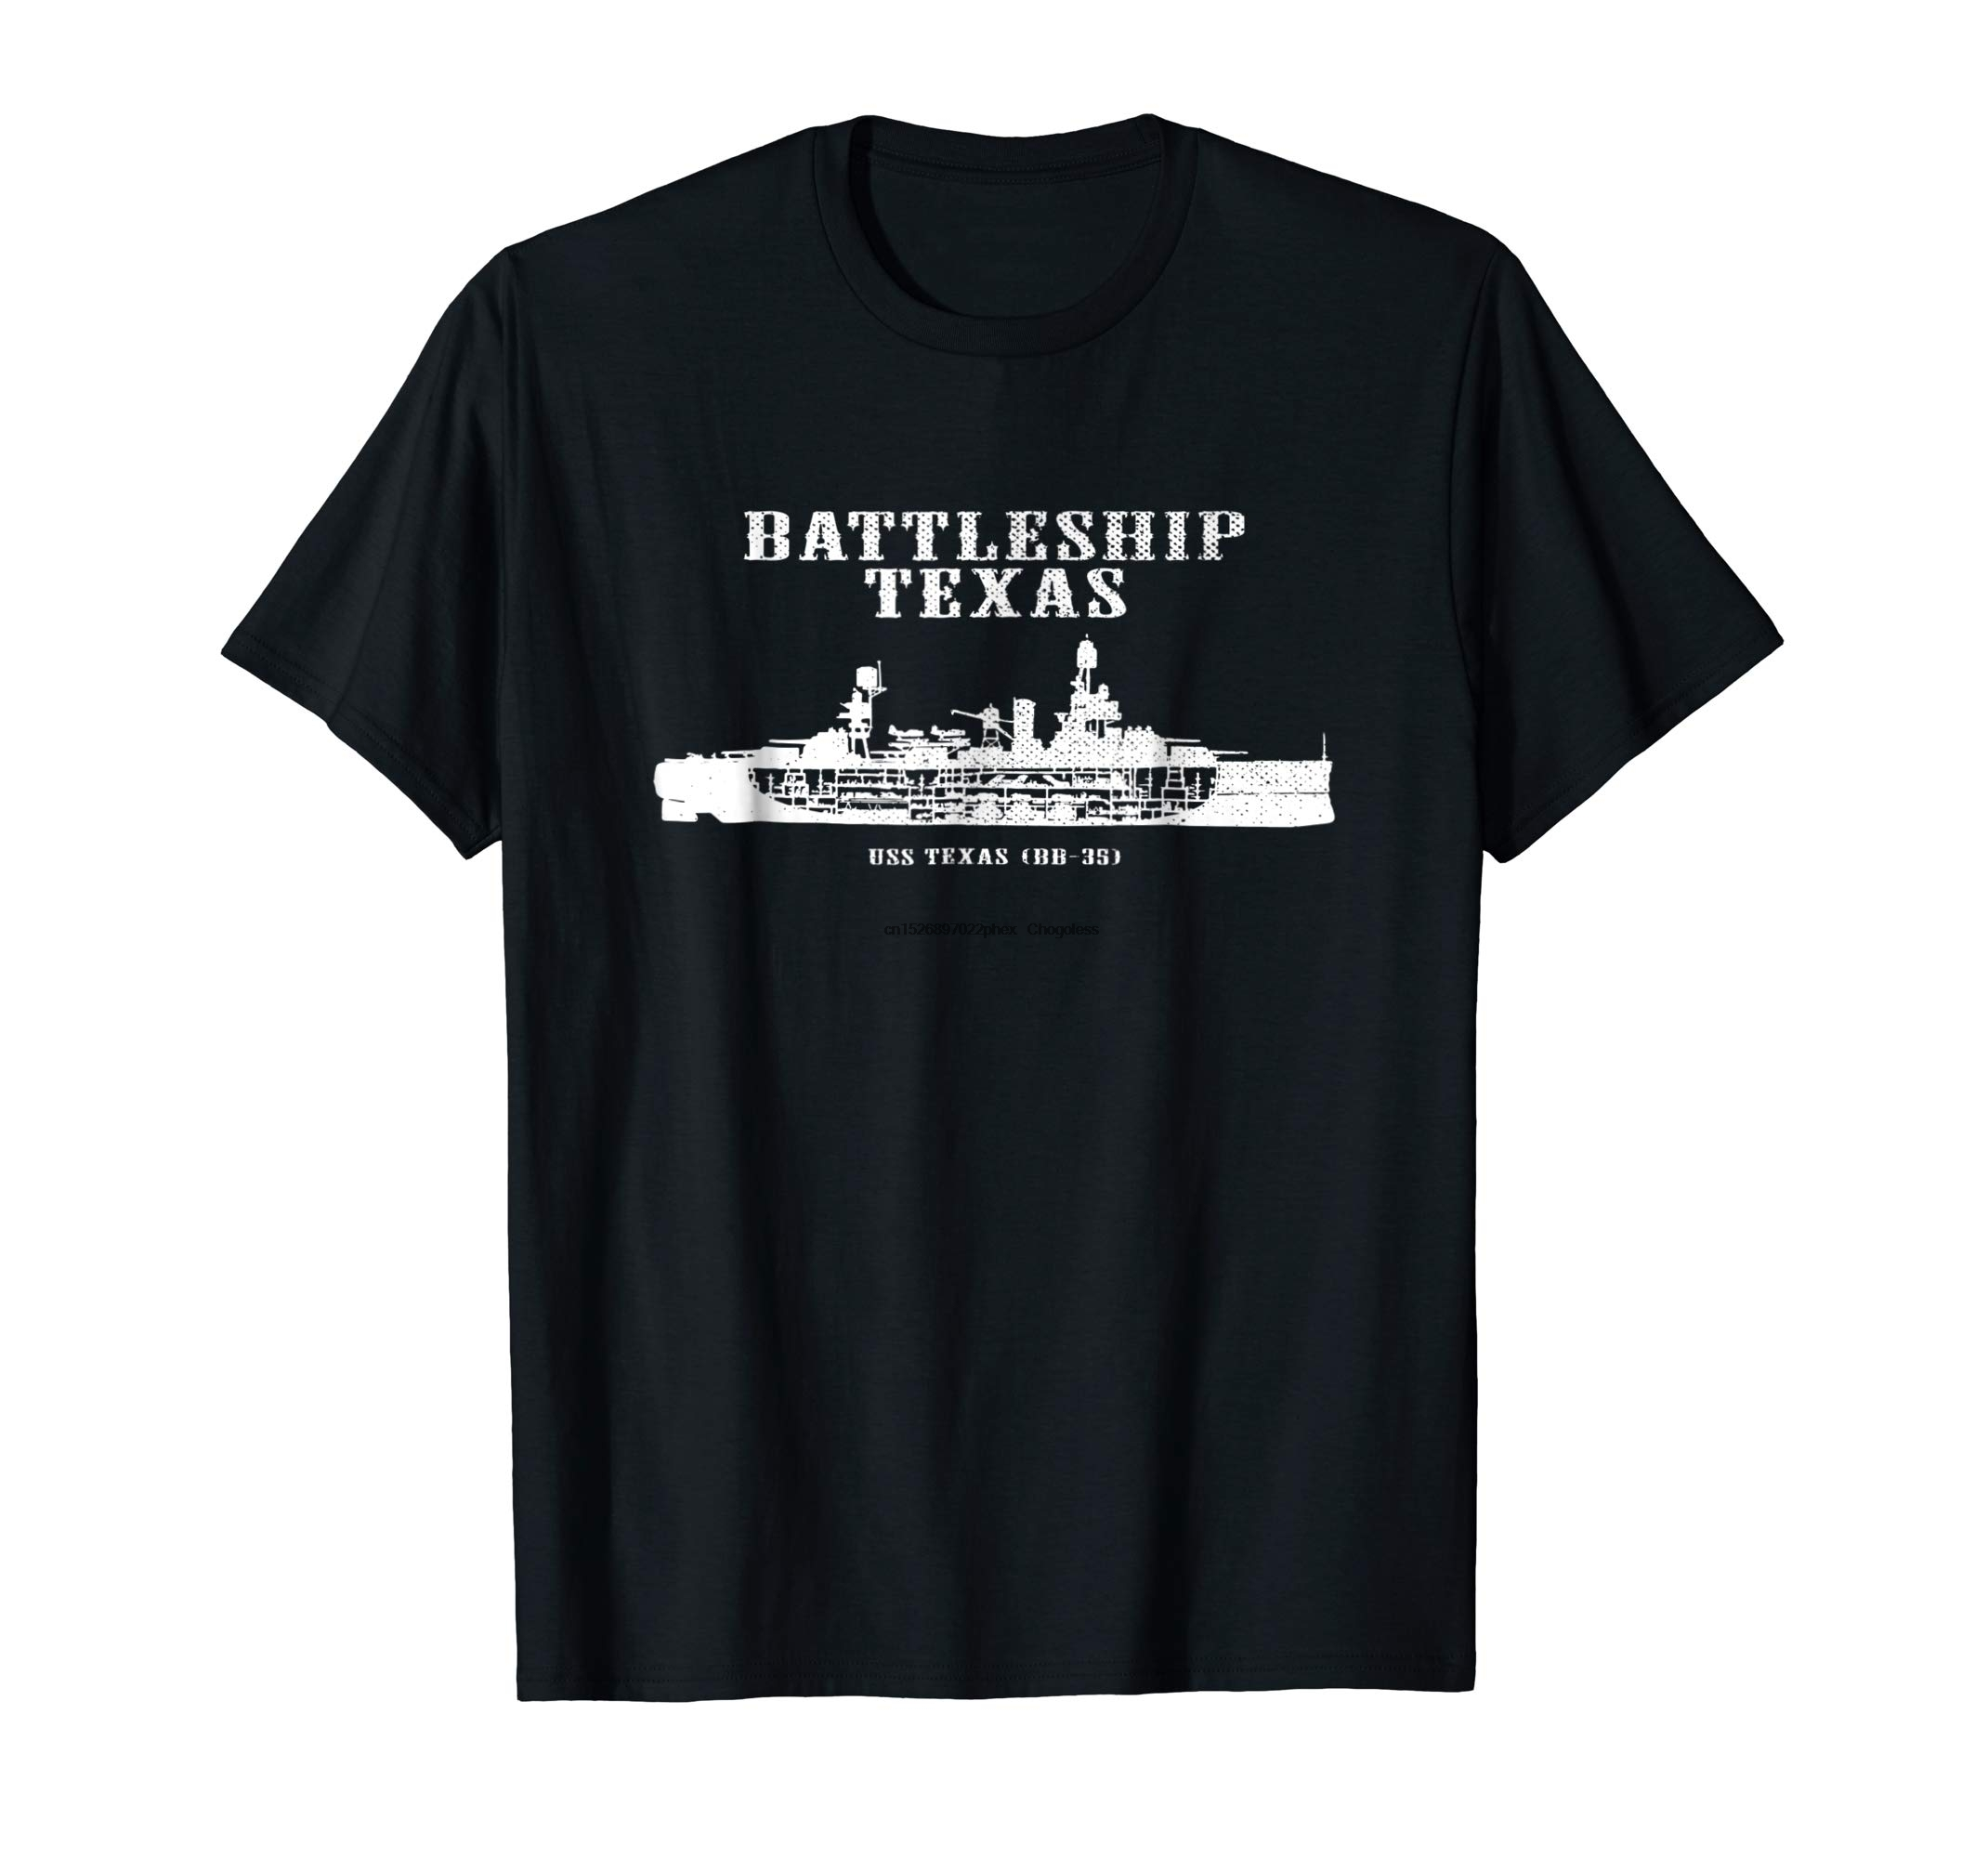 Battleship Texas Uss Texas (bb-35) мужская футболка в состаренном стиле